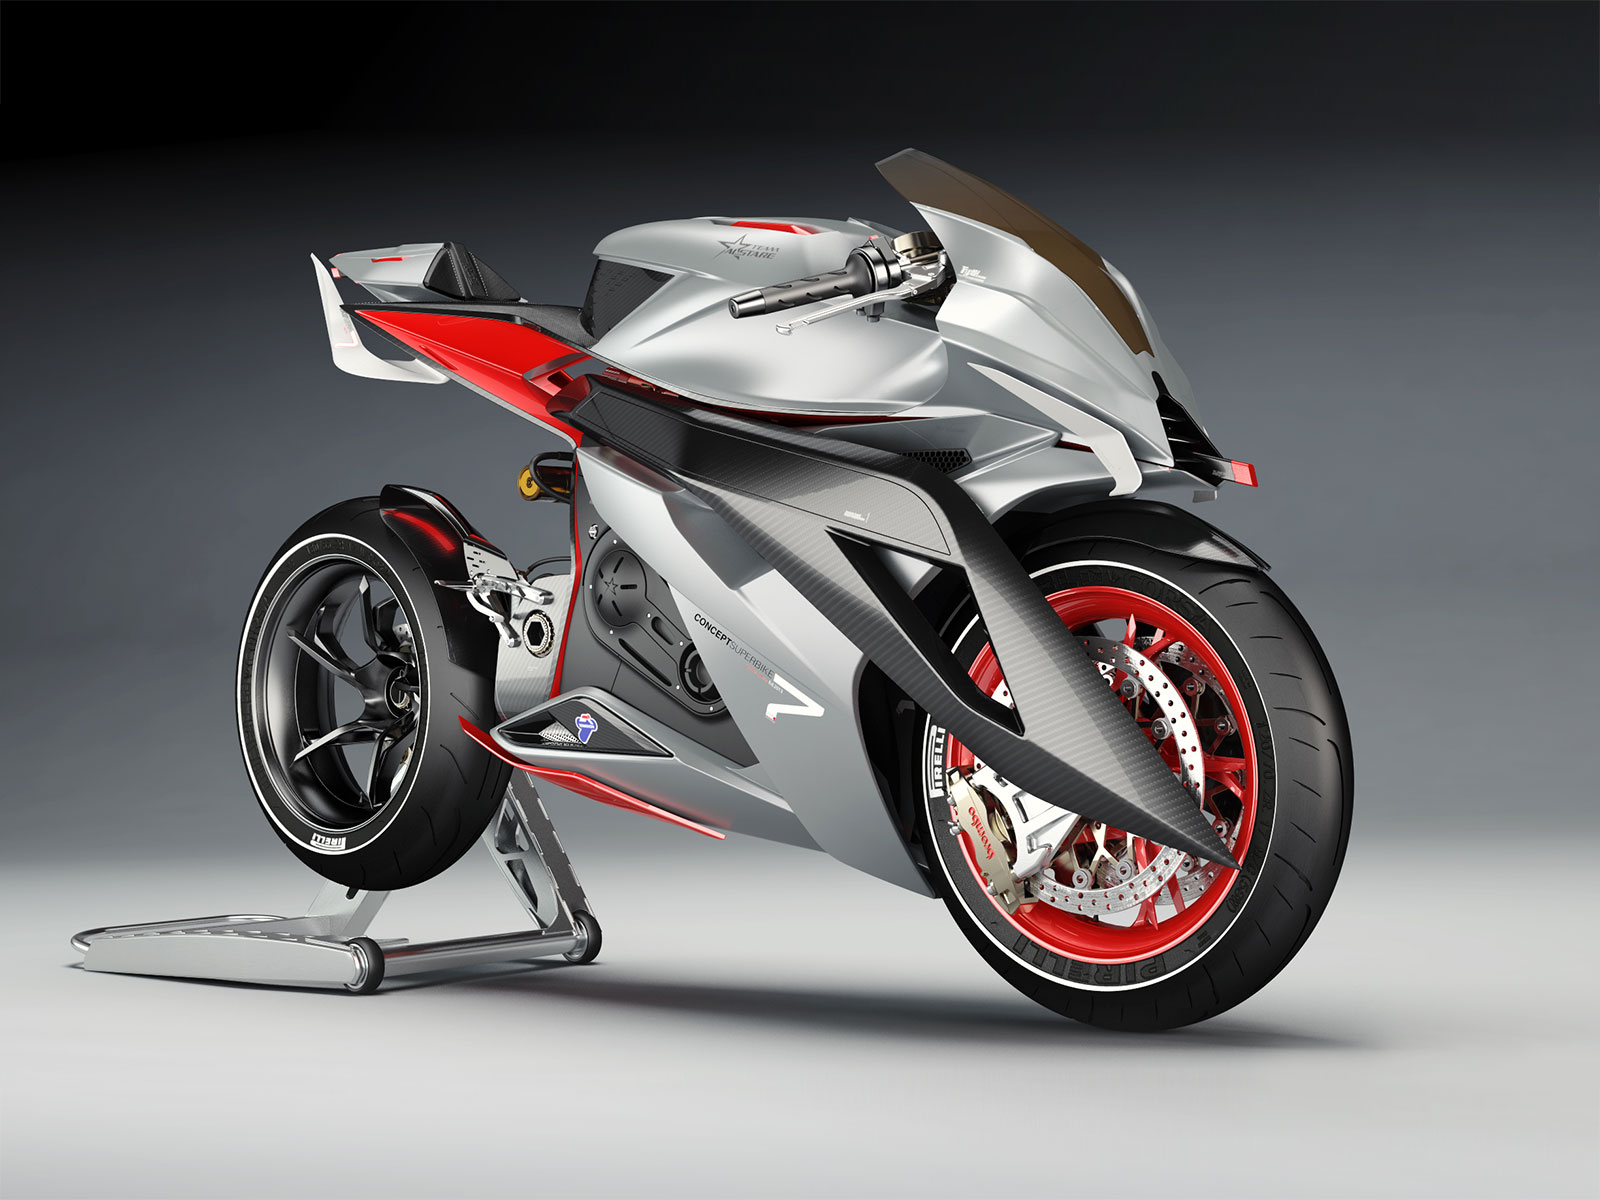 http://www.diseno-art.com/news_content/wp-content/uploads/2013/06/Alstare-Concept-Superbike-2.jpg